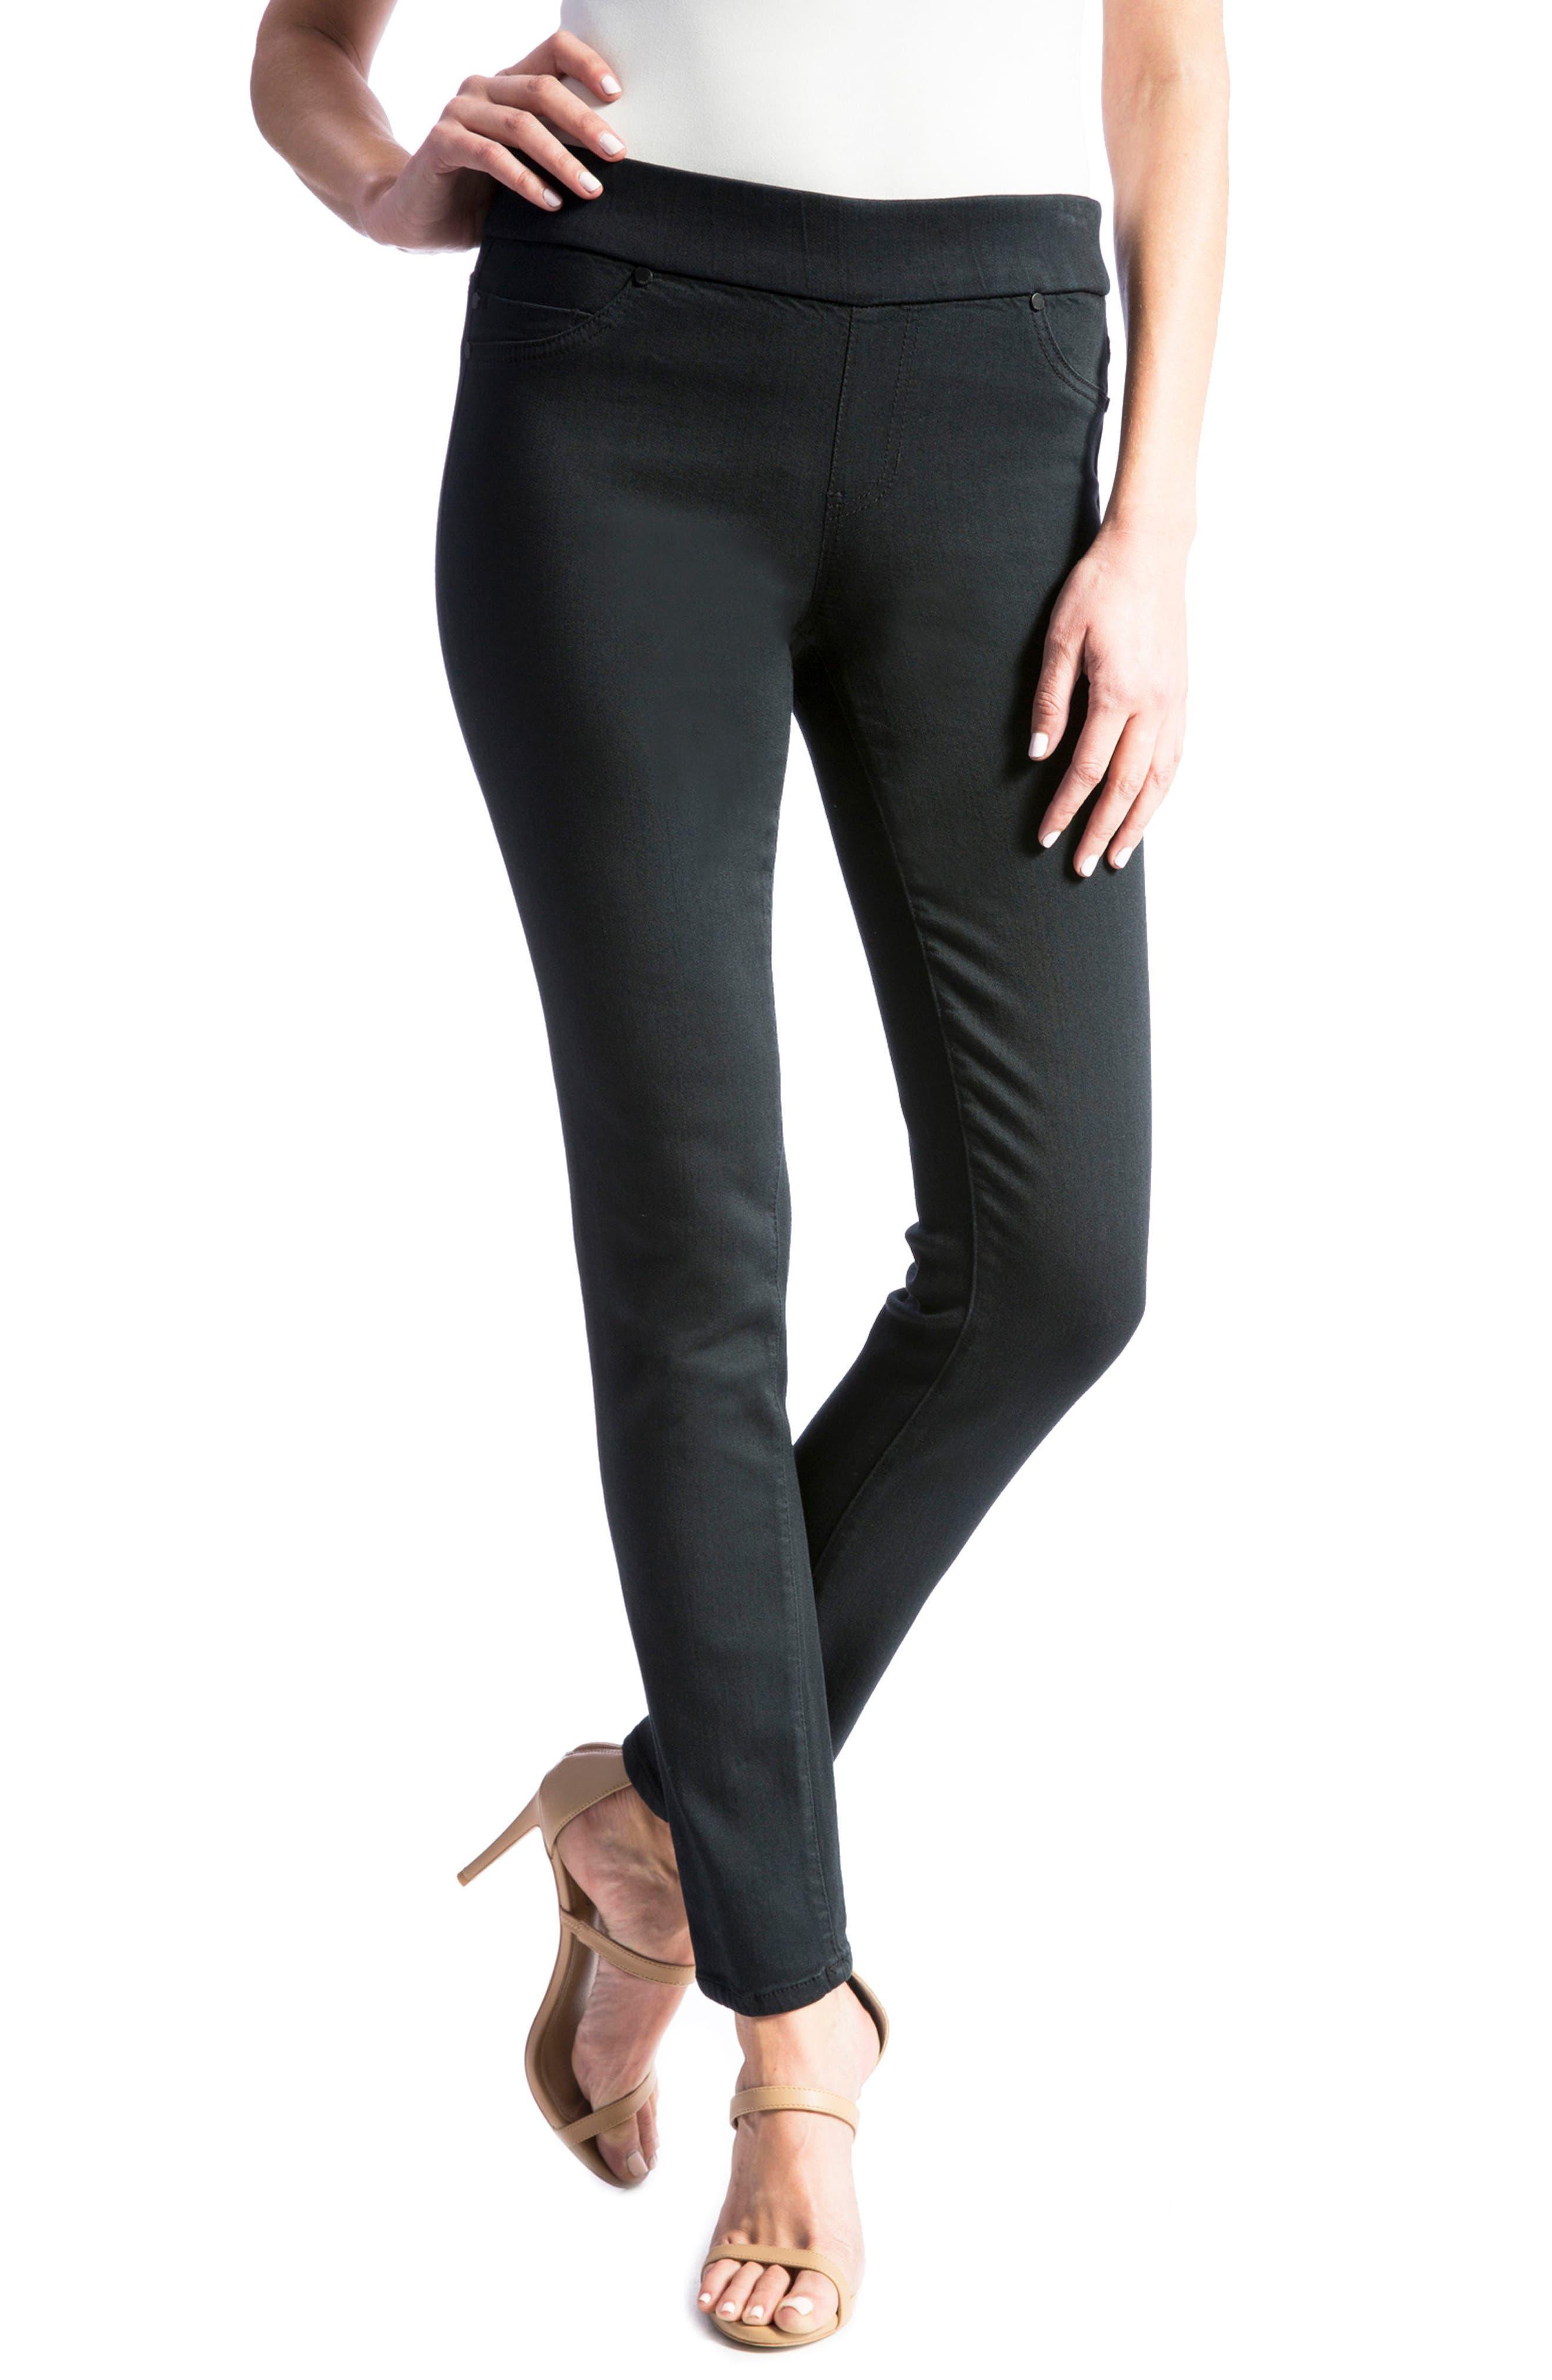 Jeans Company Sienna Mid Rise Soft Stretch Denim Leggings,                         Main,                         color, INDIGO OVERDYE BLACK